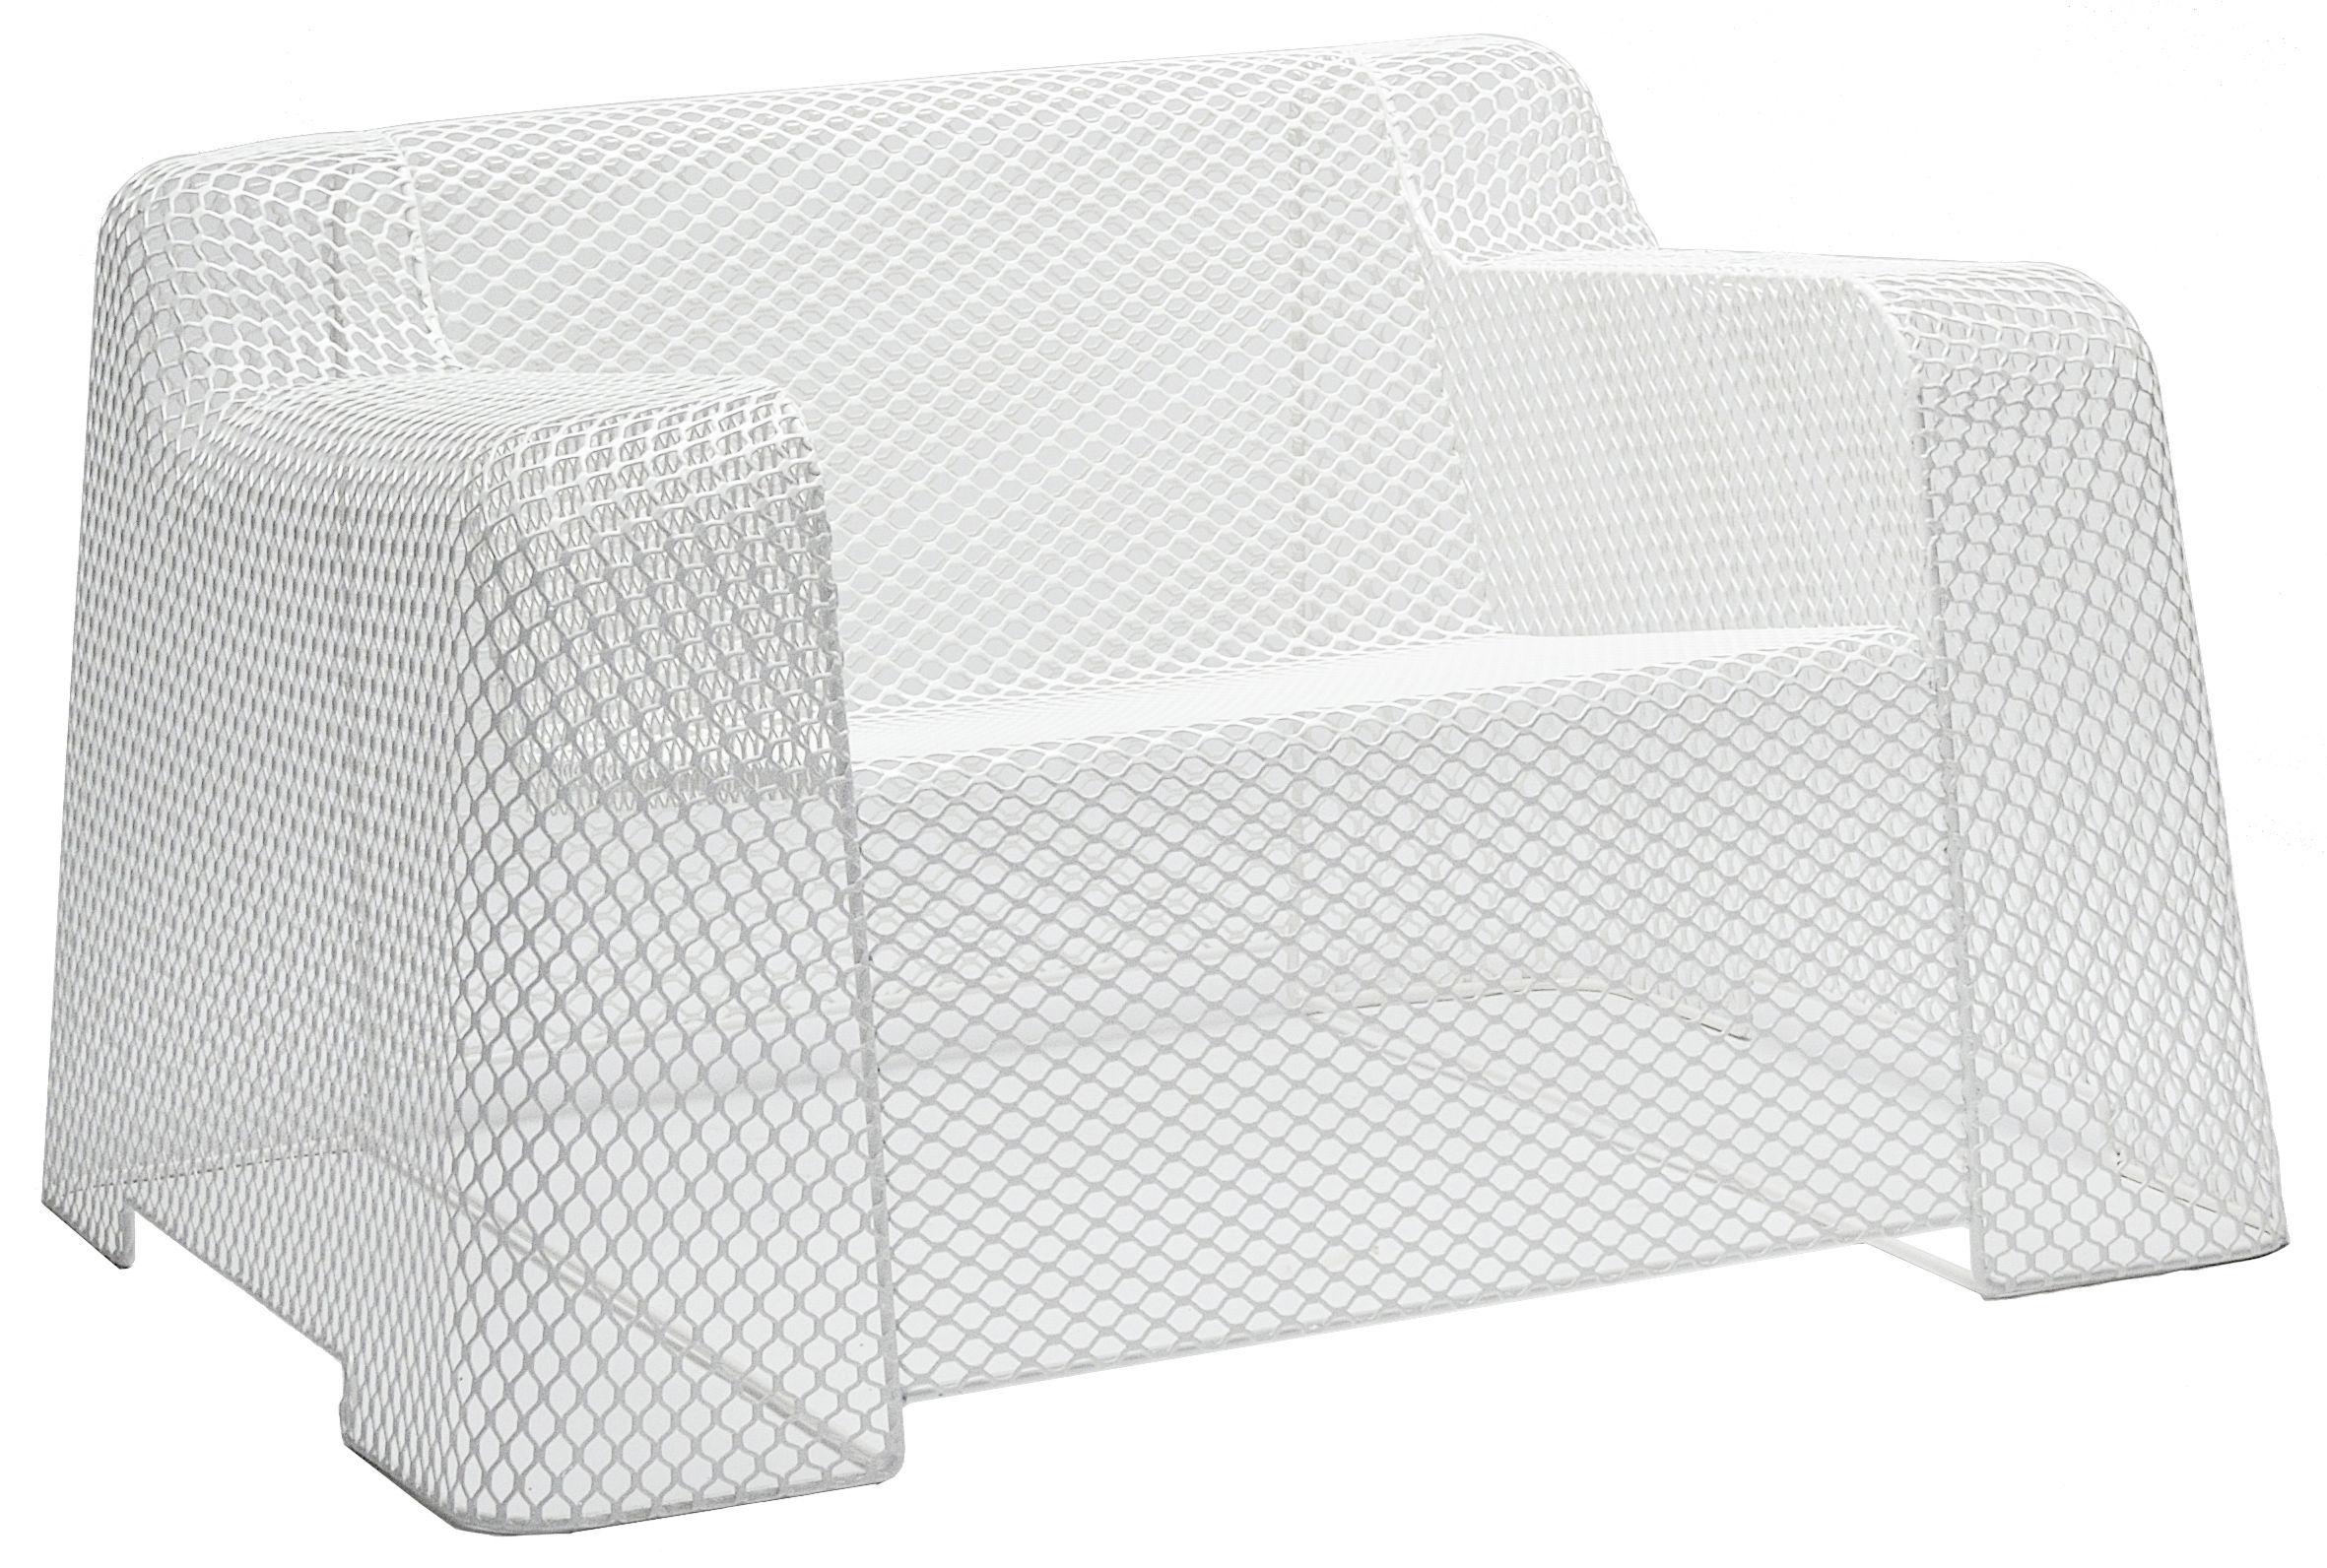 Möbel - Lounge Sessel - Ivy Sessel - Emu - Weiß - Stahl